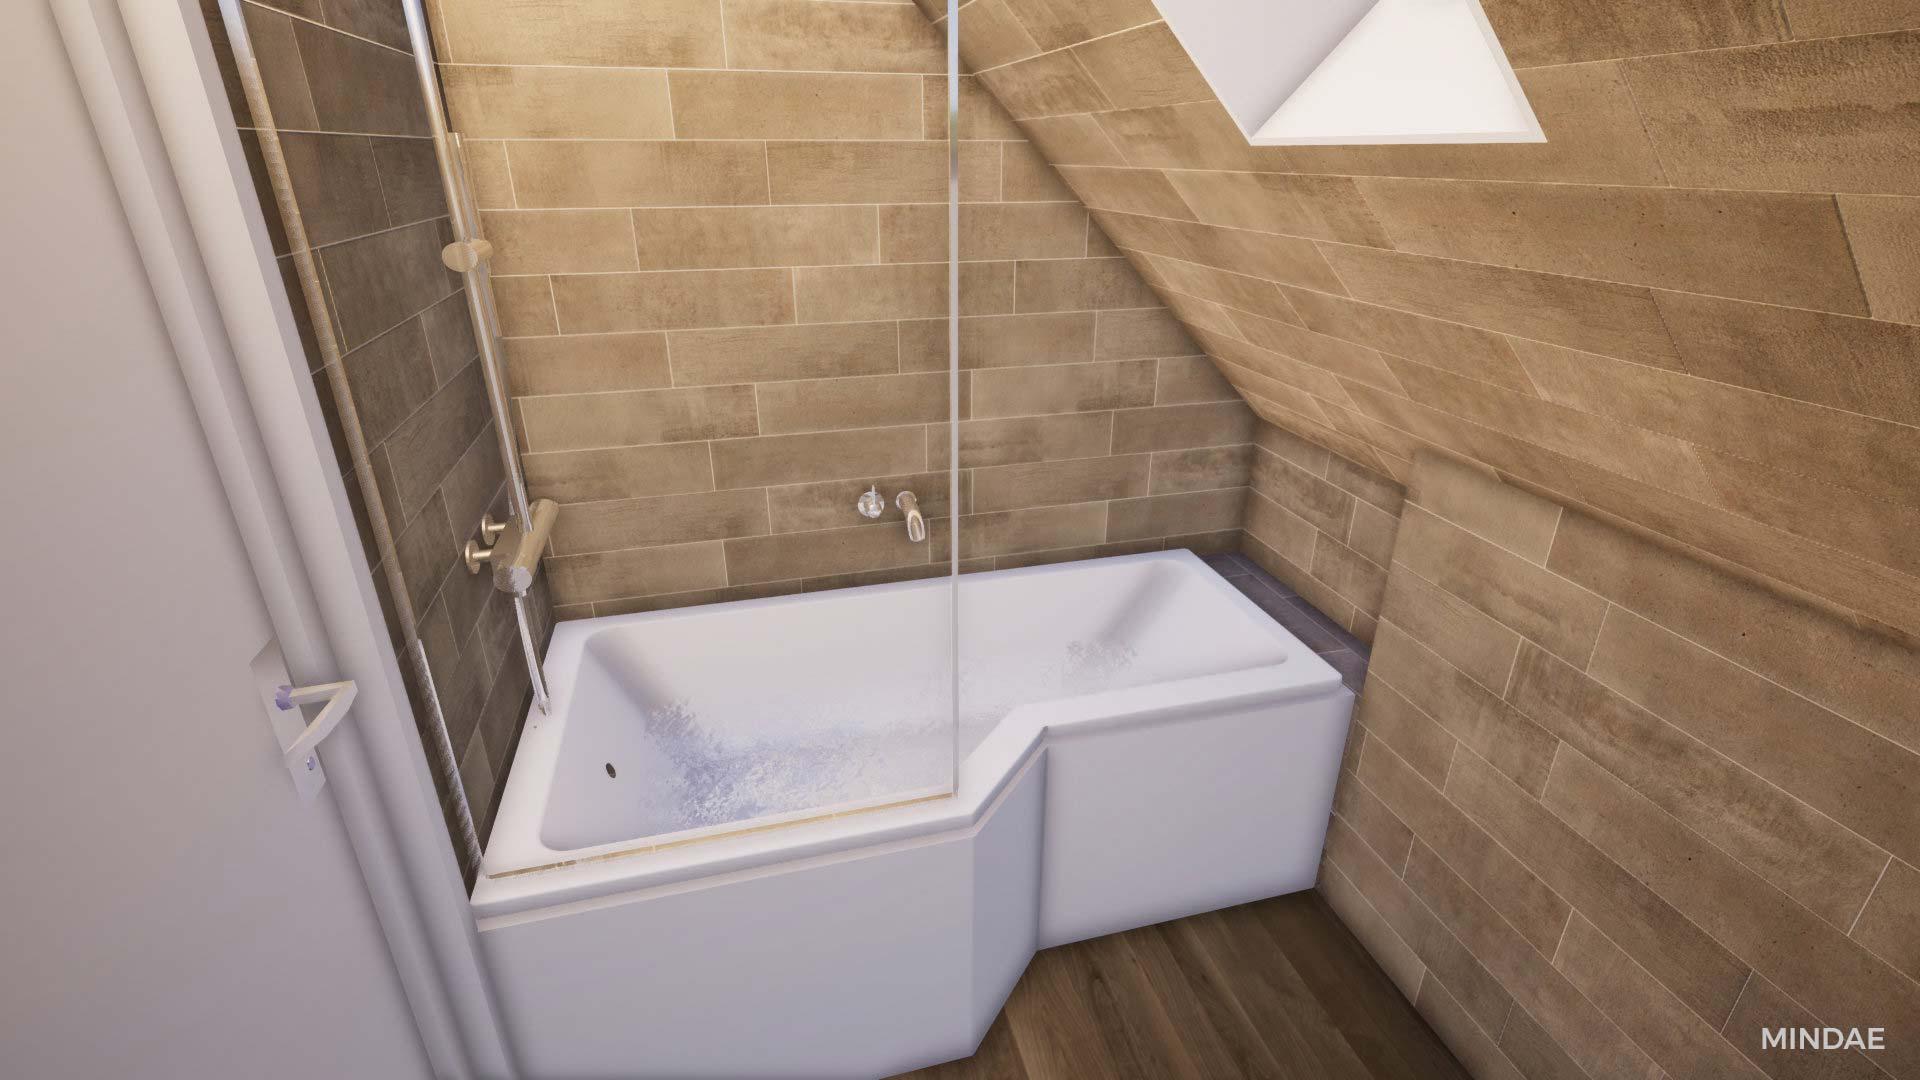 Mindae_3D_SDB_salle_de_bain_projet_renovation_2G_plomberie_calvados-(1)